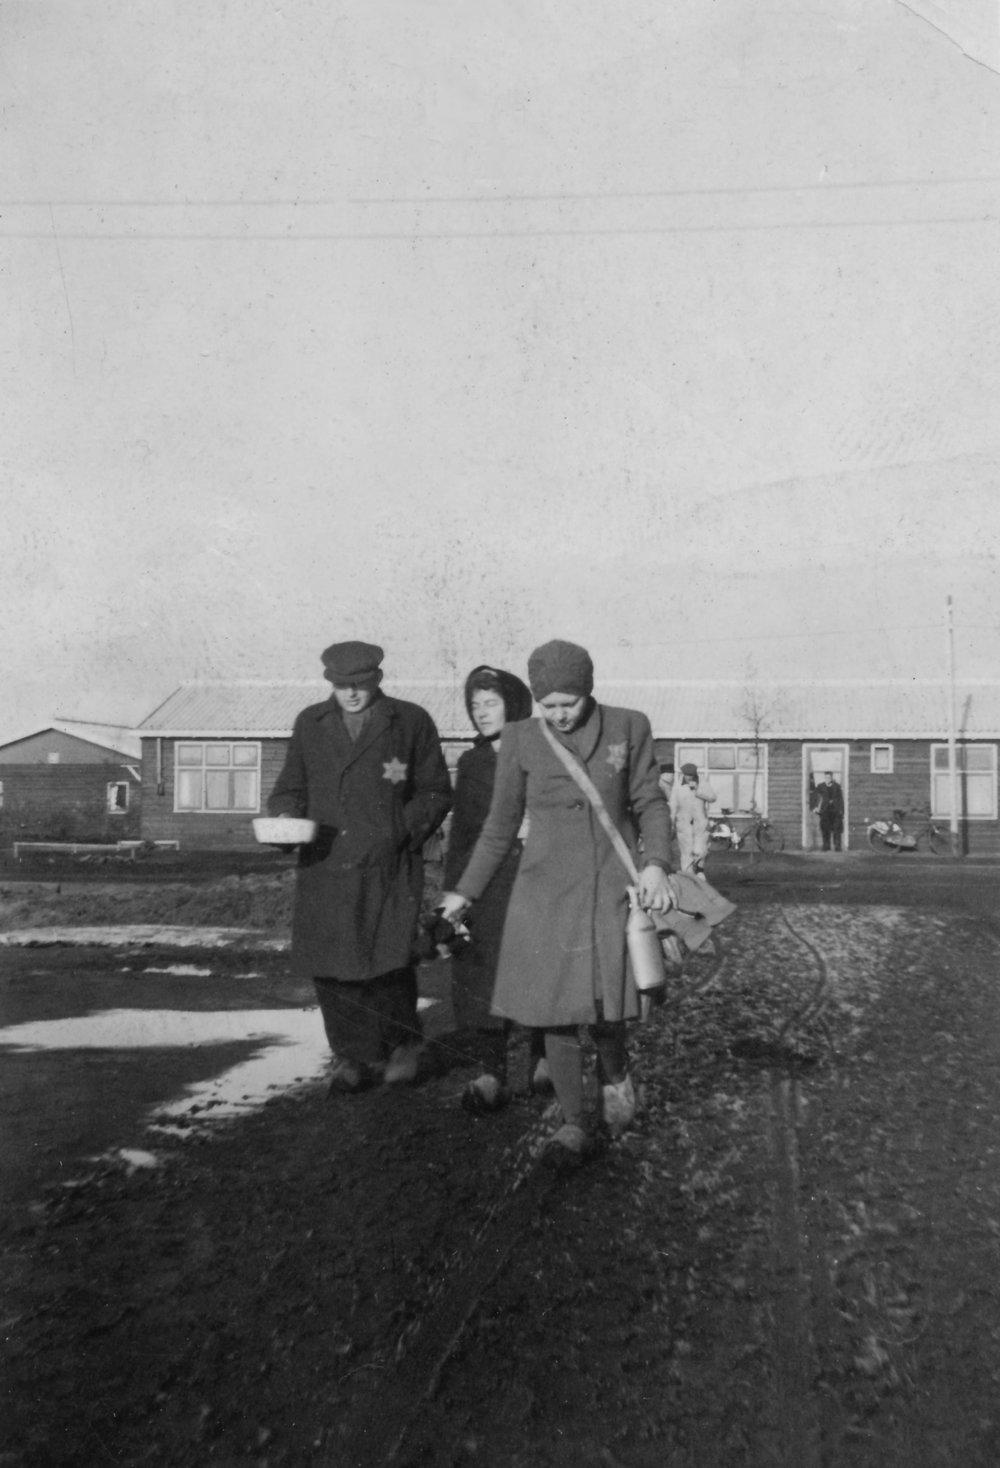 NIOD, november 1942